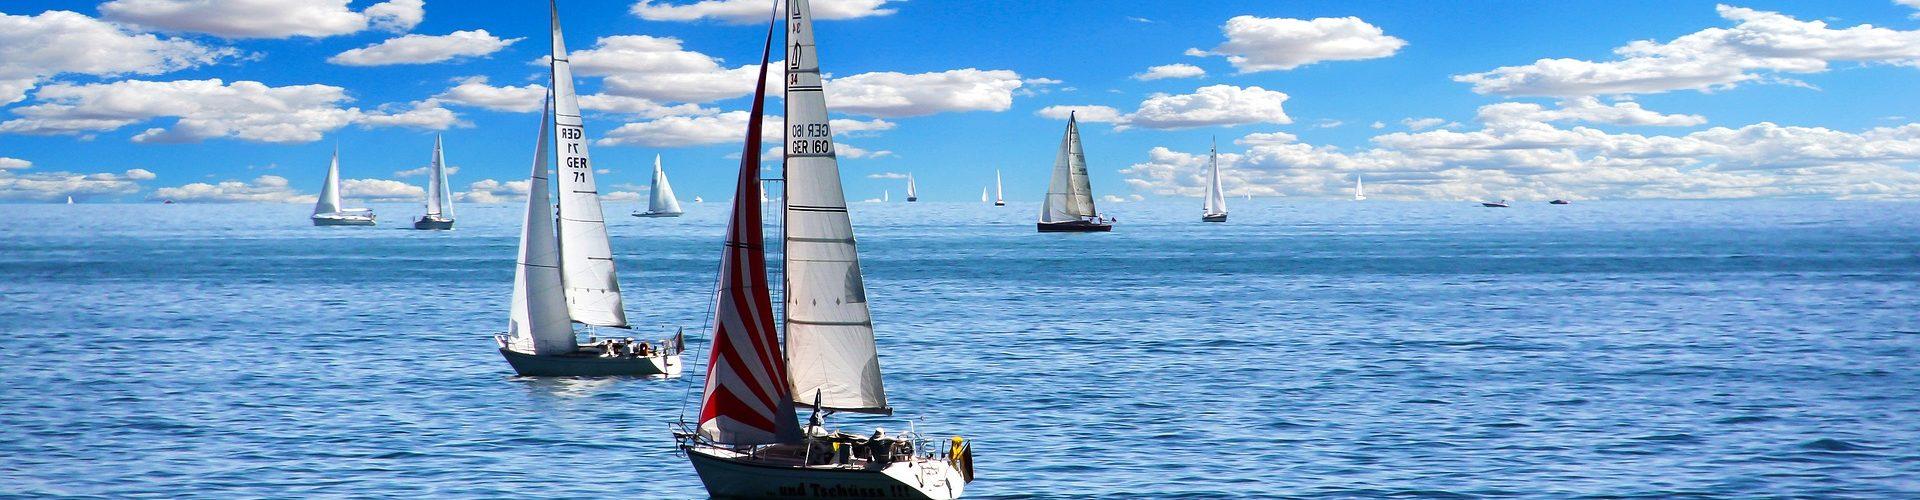 segeln lernen in Krummhörn Greetsiel segelschein machen in Krummhörn Greetsiel 1920x500 - Segeln lernen in Krummhörn Greetsiel